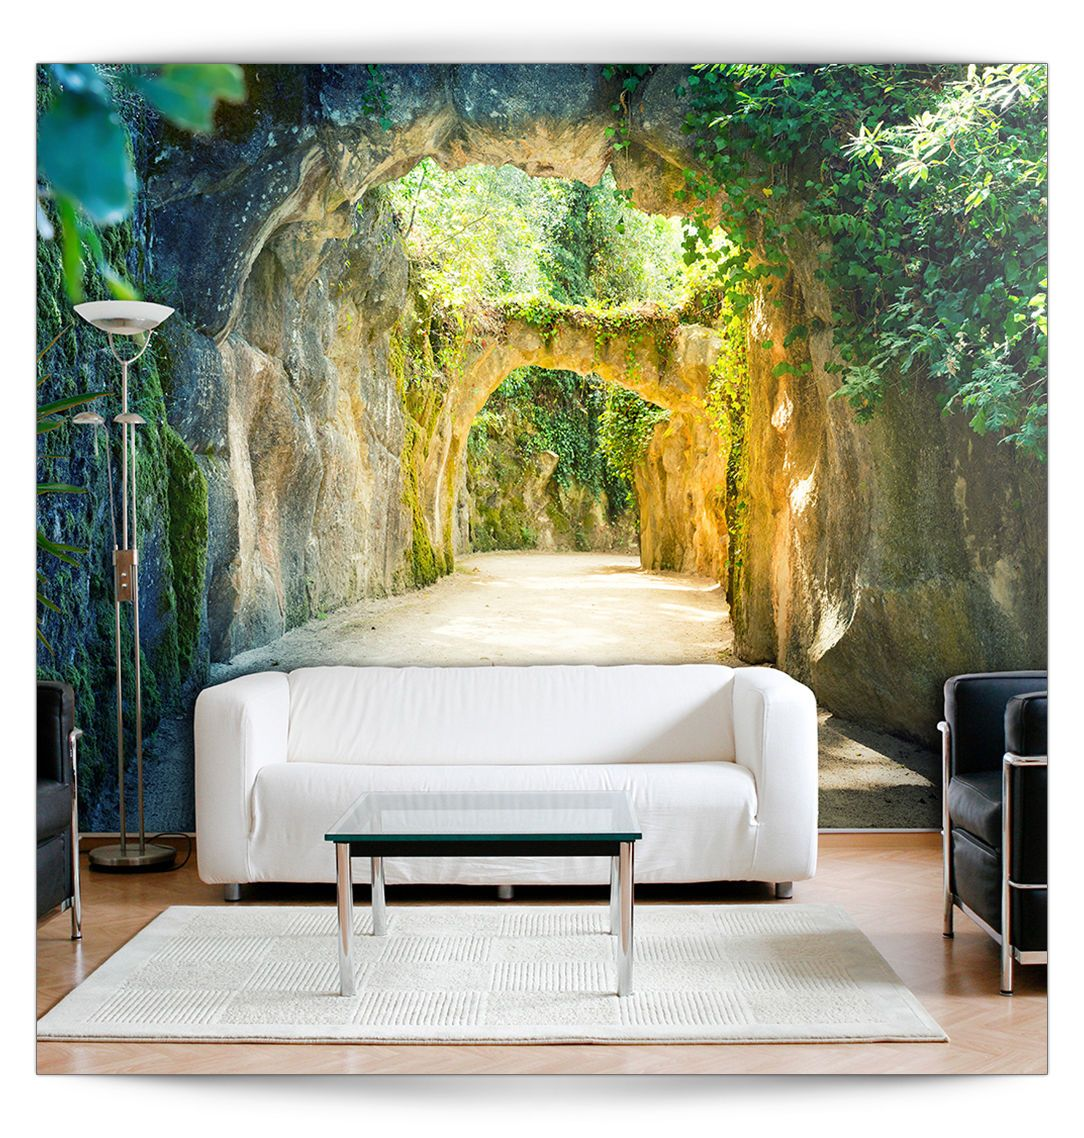 Vlies Fototapete 3d Tunnel Tapete Tapeten Schlafzimmer Wandbild Xxl